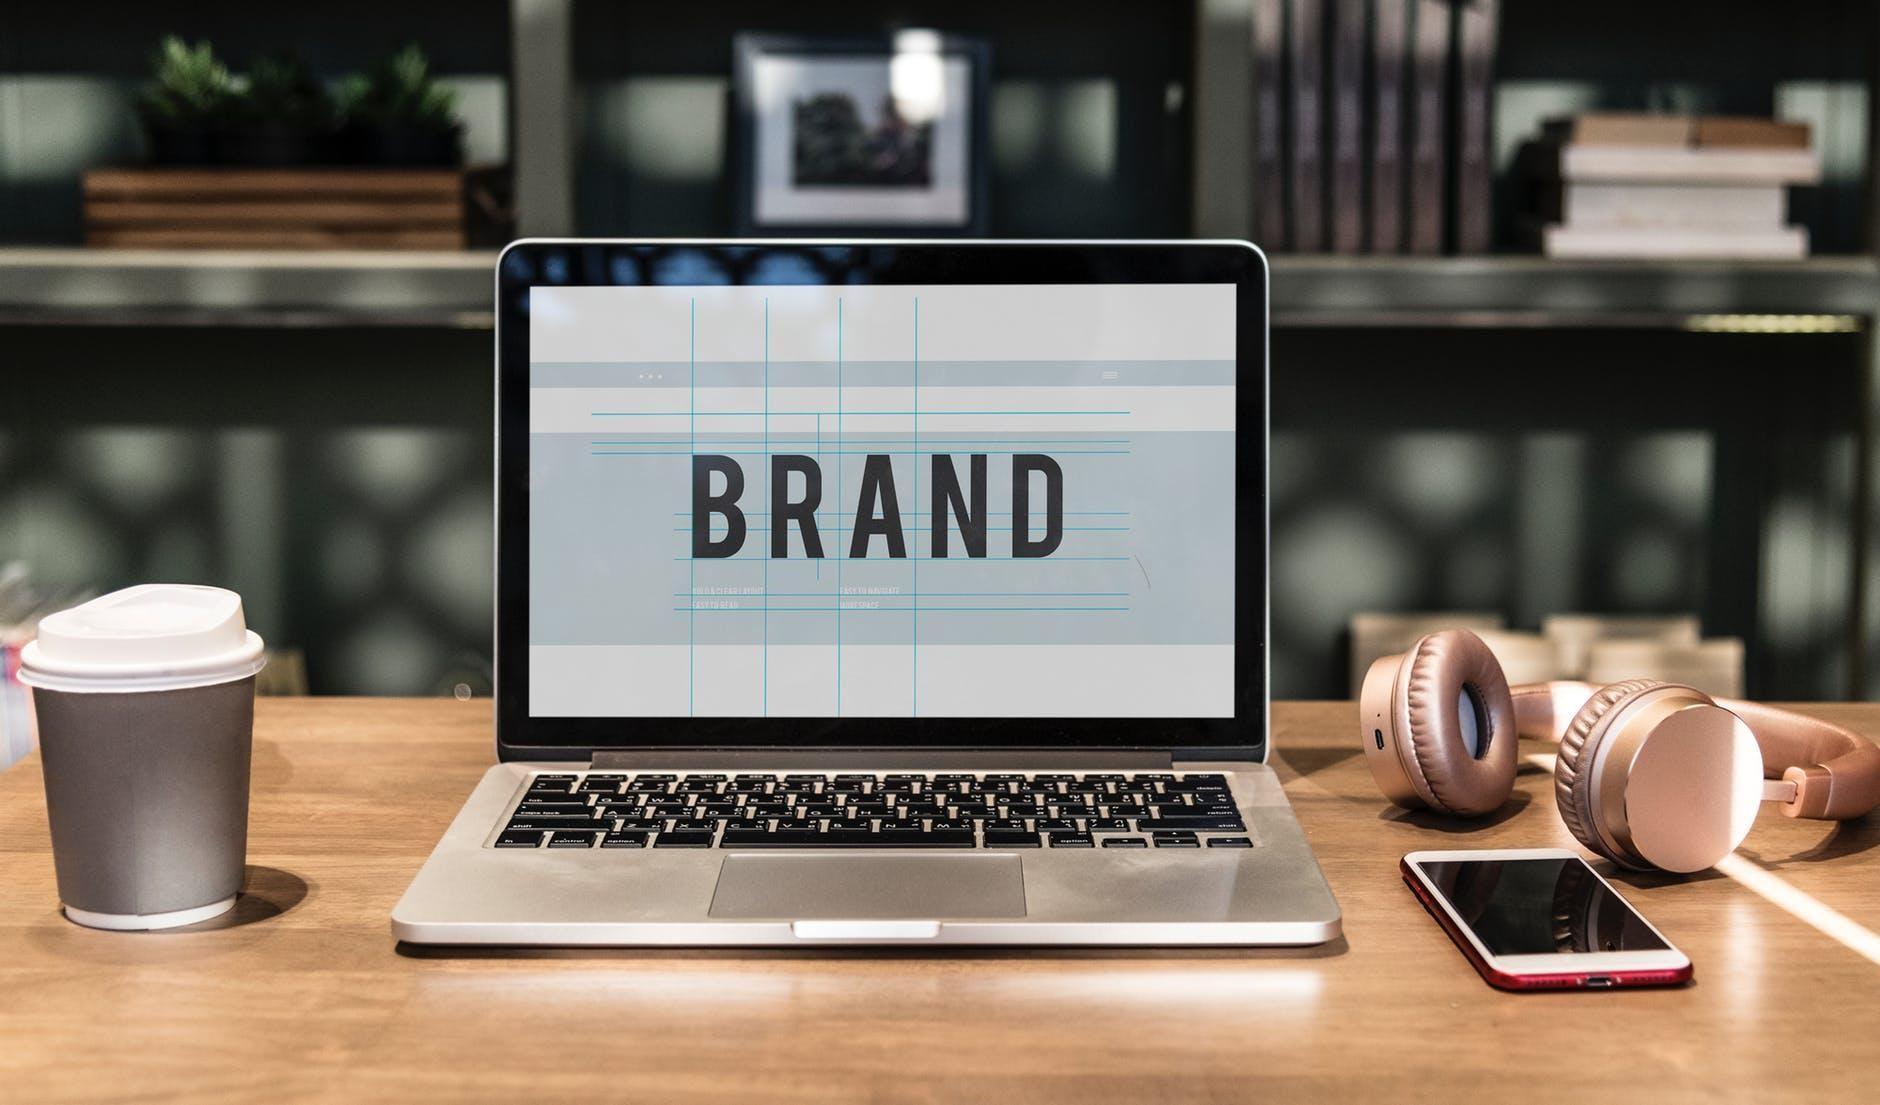 brand on grey laptop